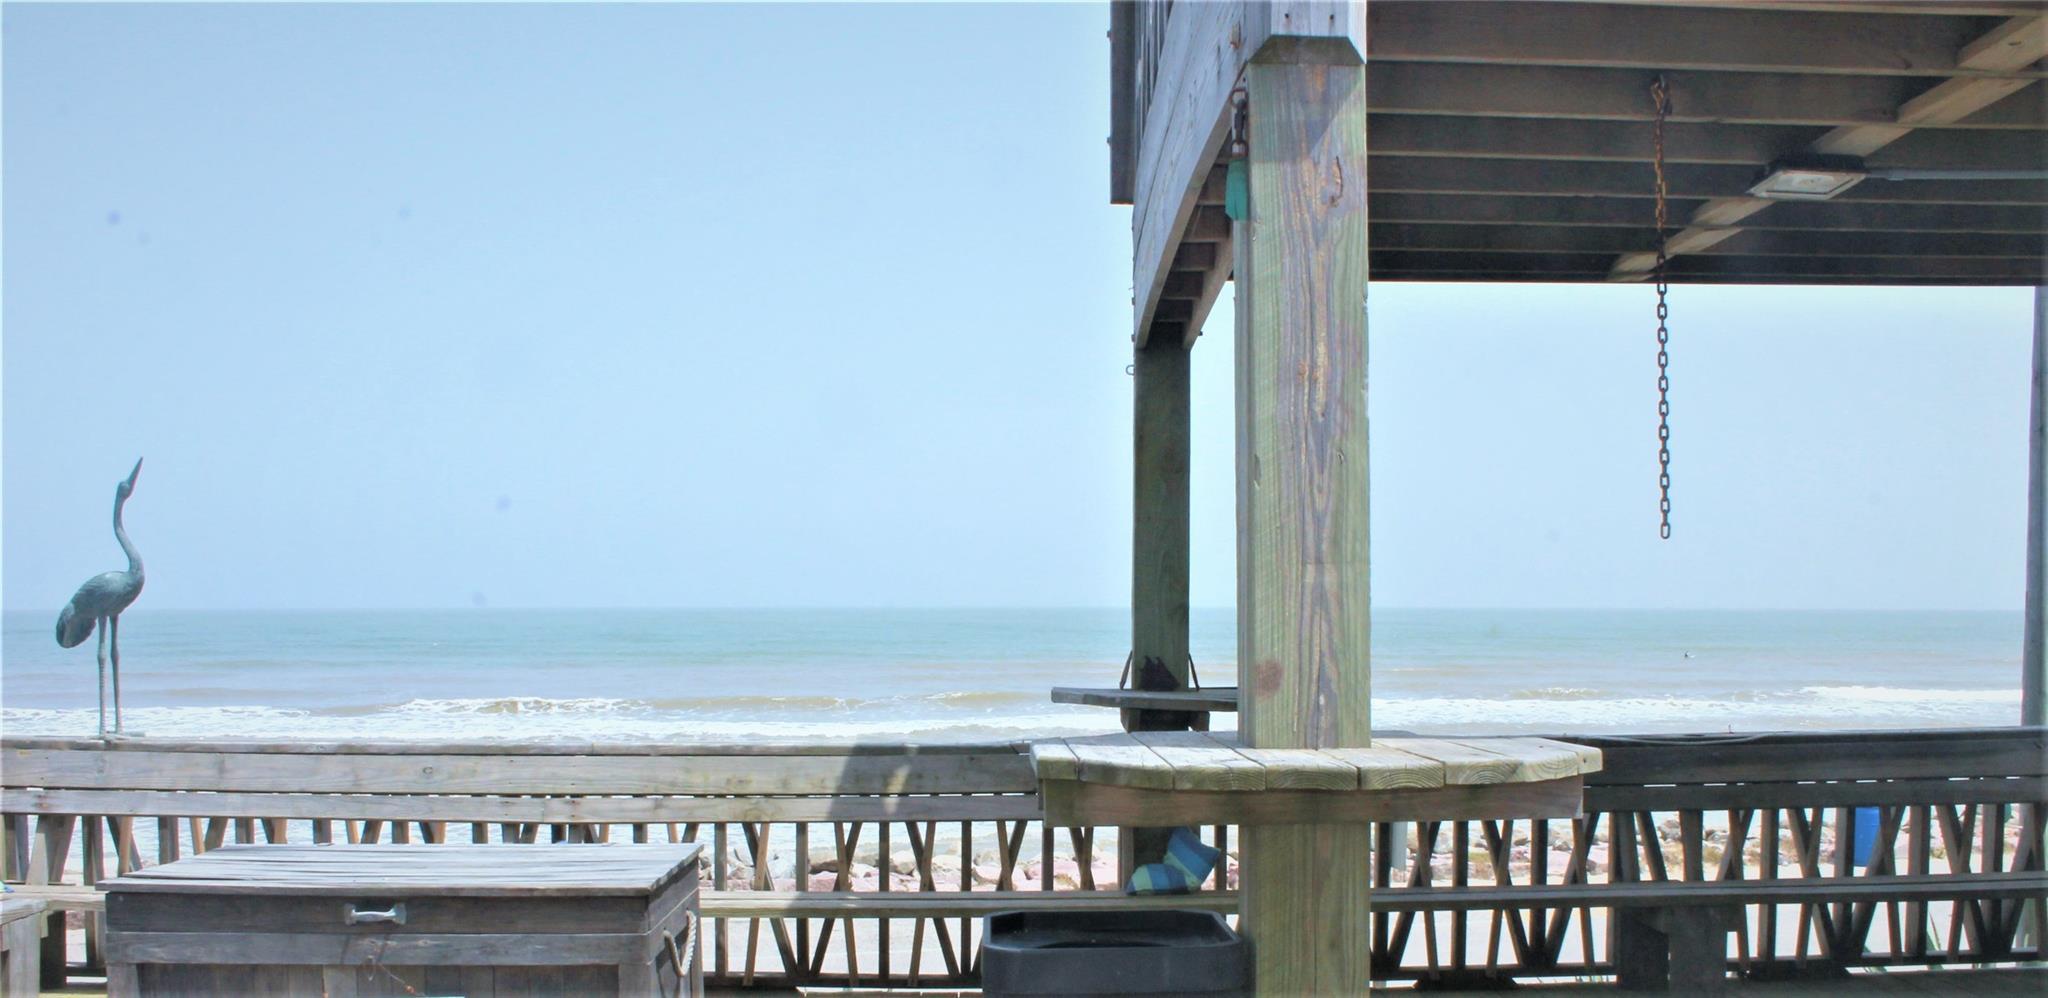 418 BEACH Drive Property Photo - Surfside Beach, TX real estate listing